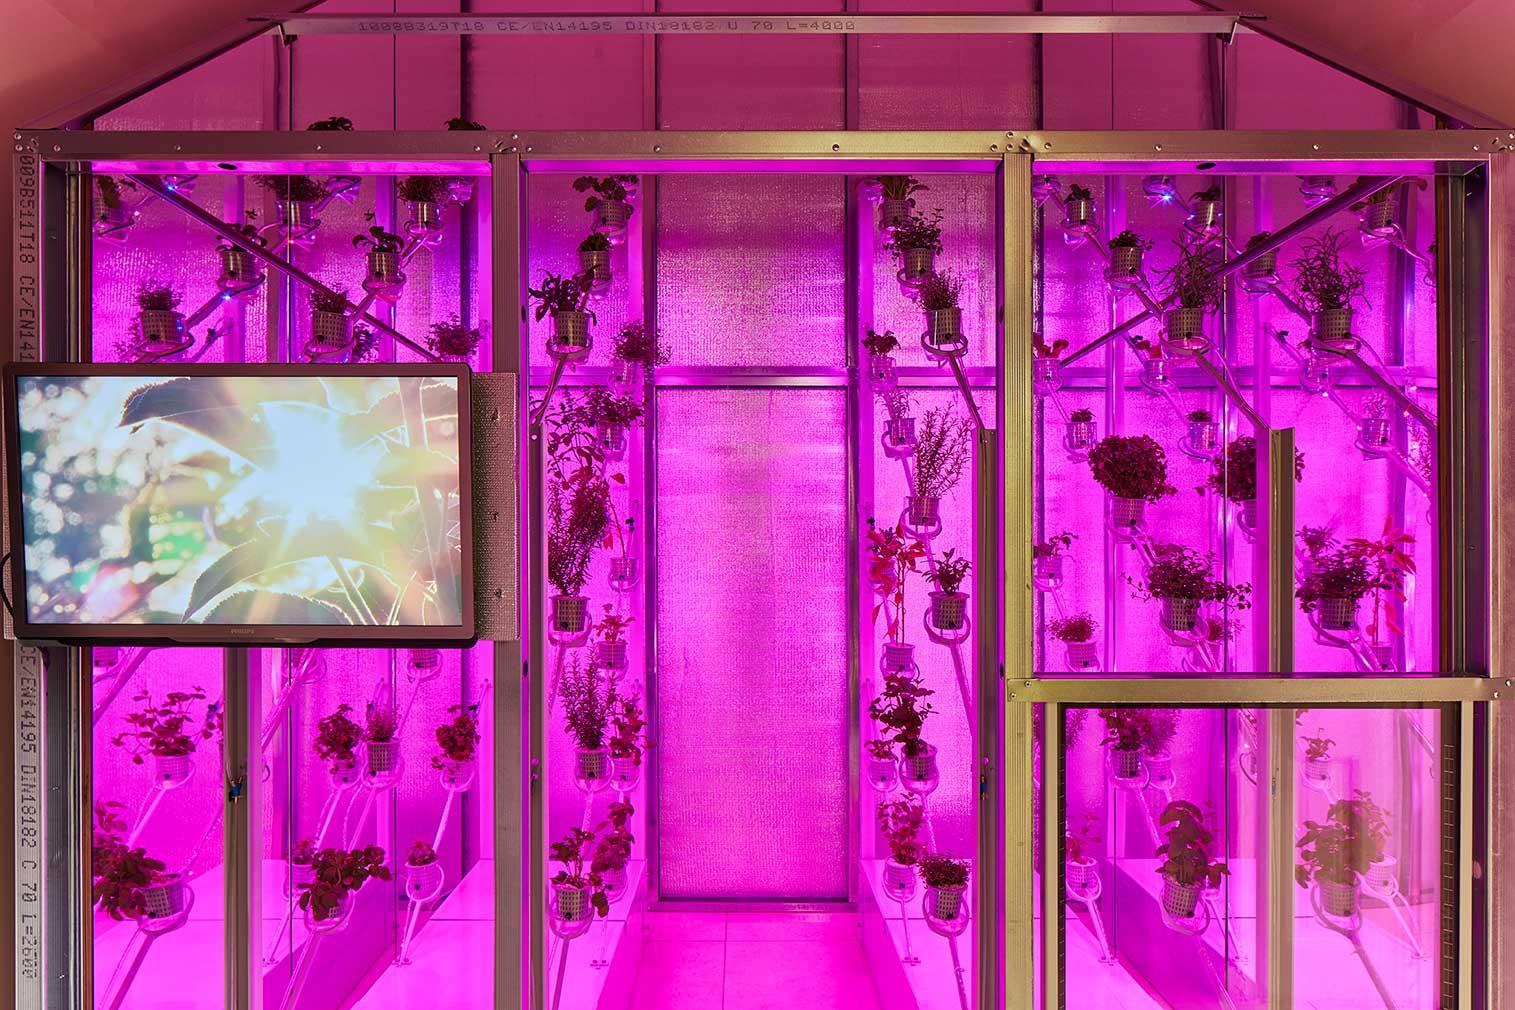 The Netherlands' pavilion at London Design Biennale 2018